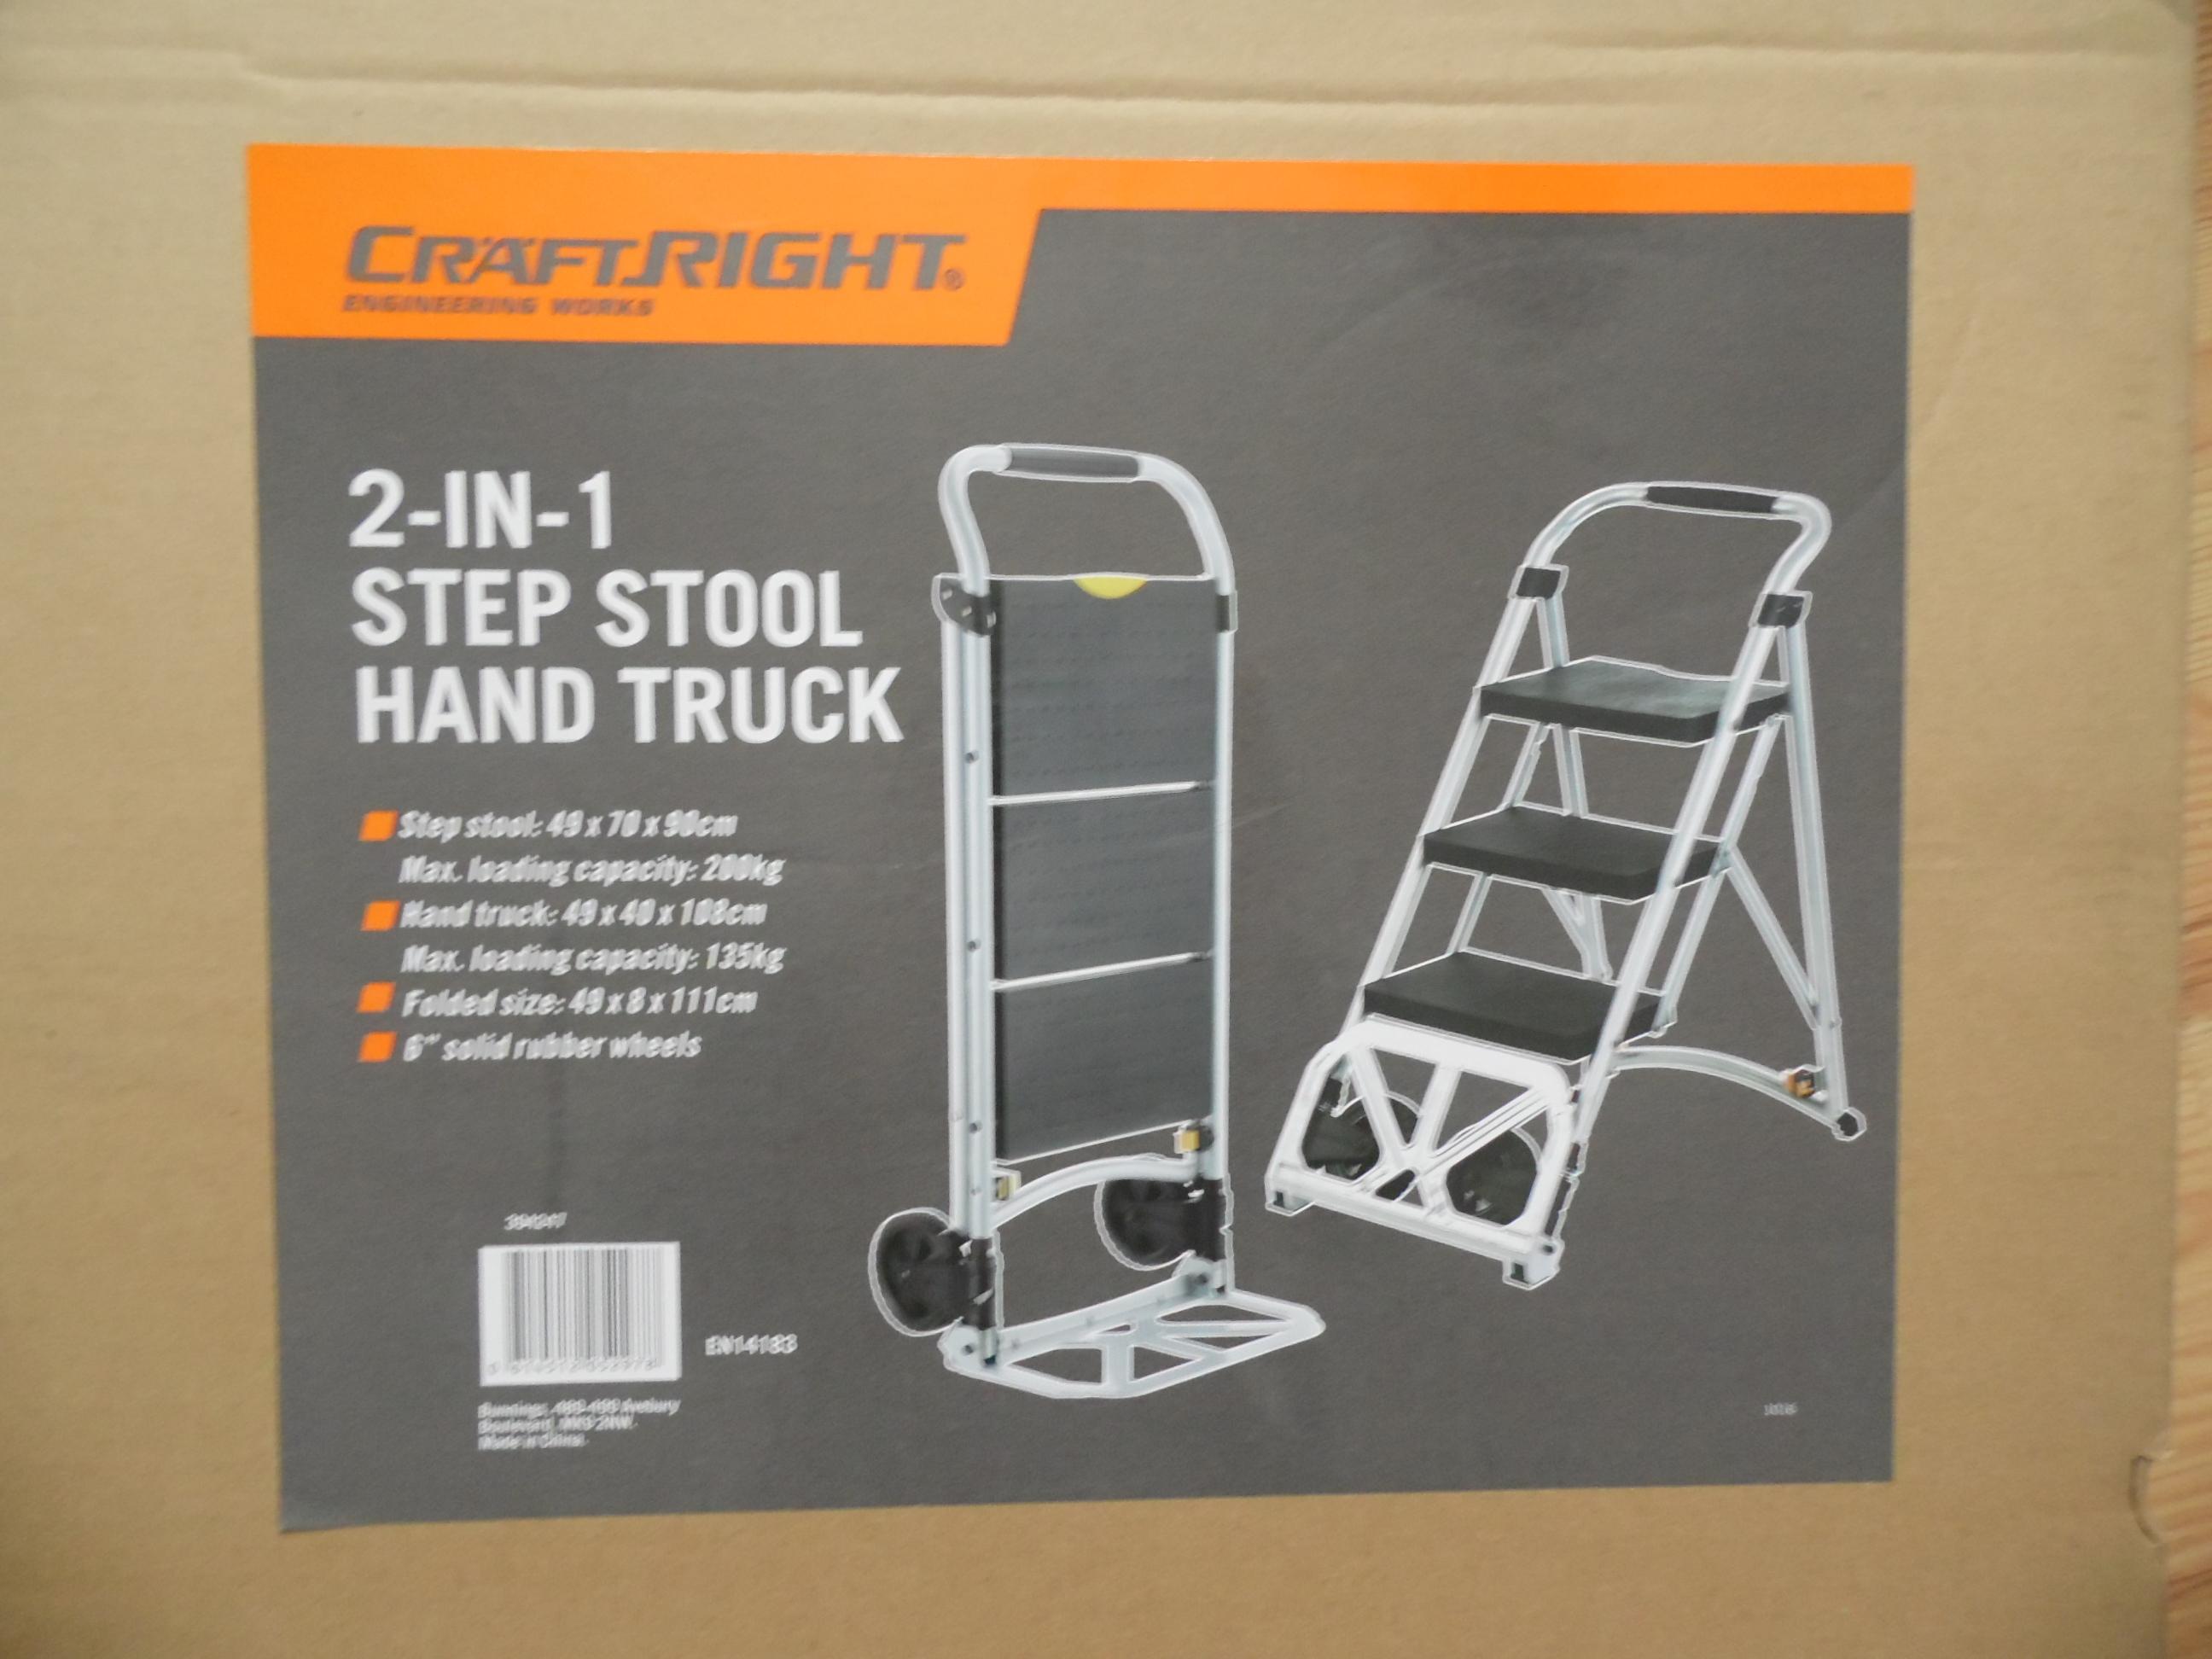 Homebase Hand truck/ step stool combo. £7.